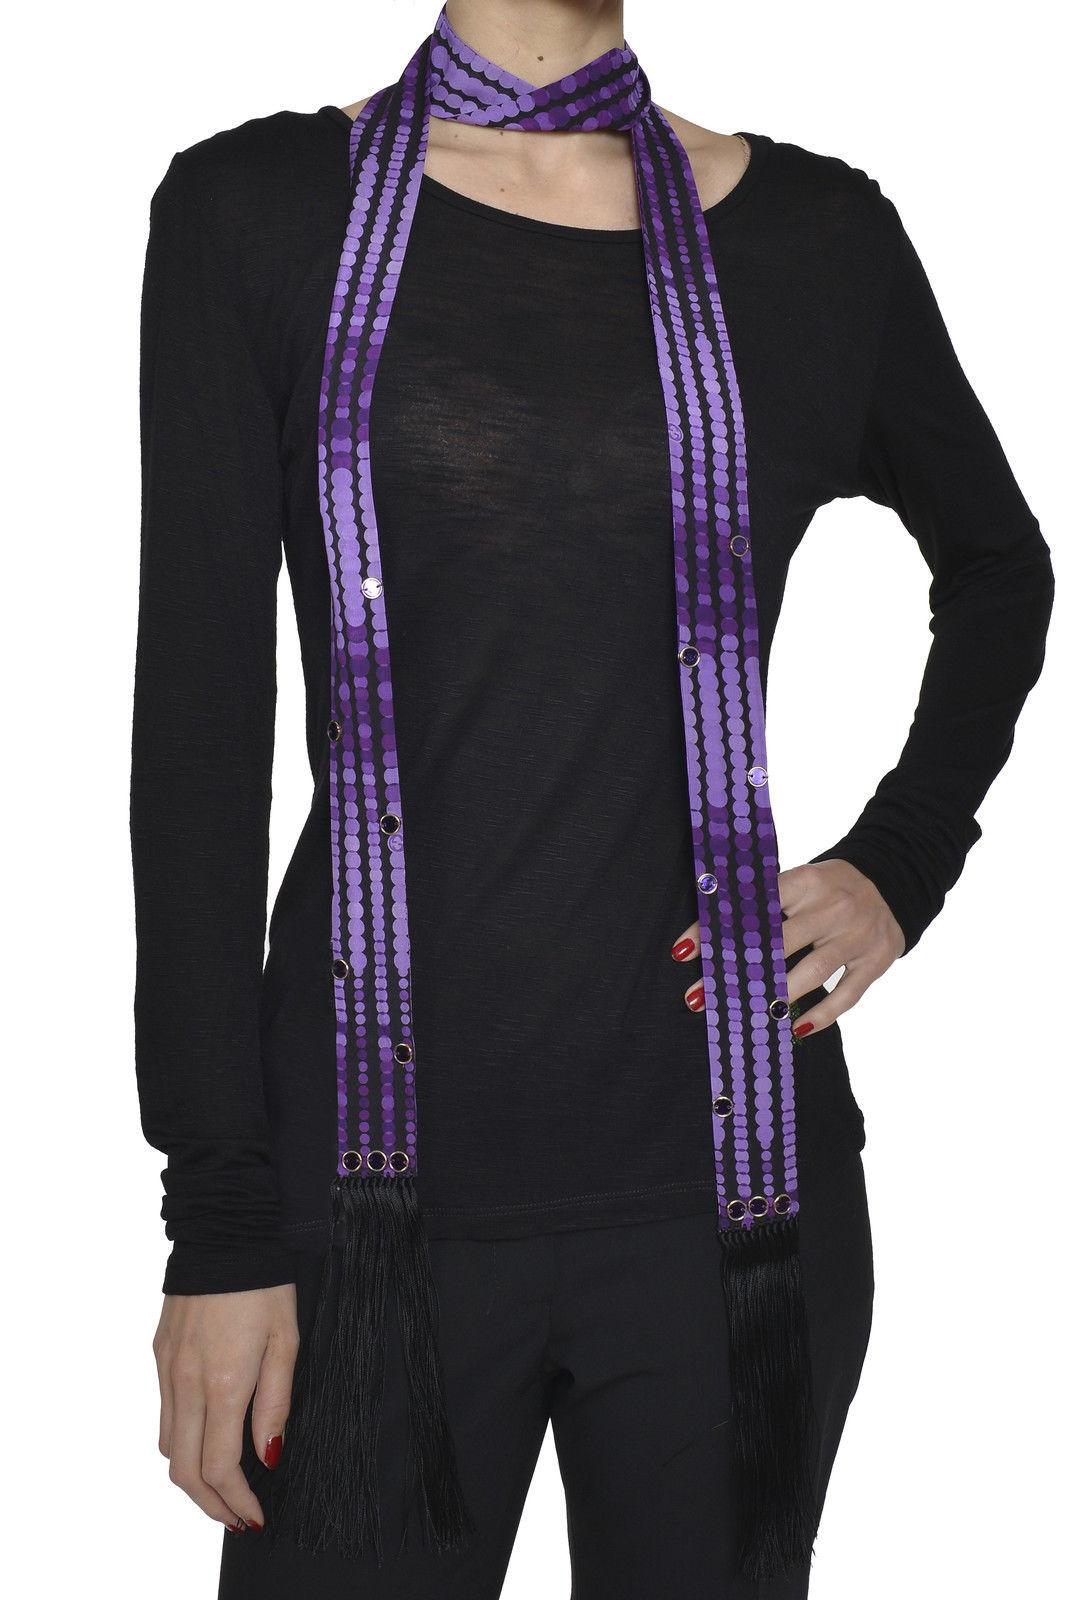 Gucci Women`s Silk Scarf 169178 3G035 70x1.3/4 Black Violet 1071